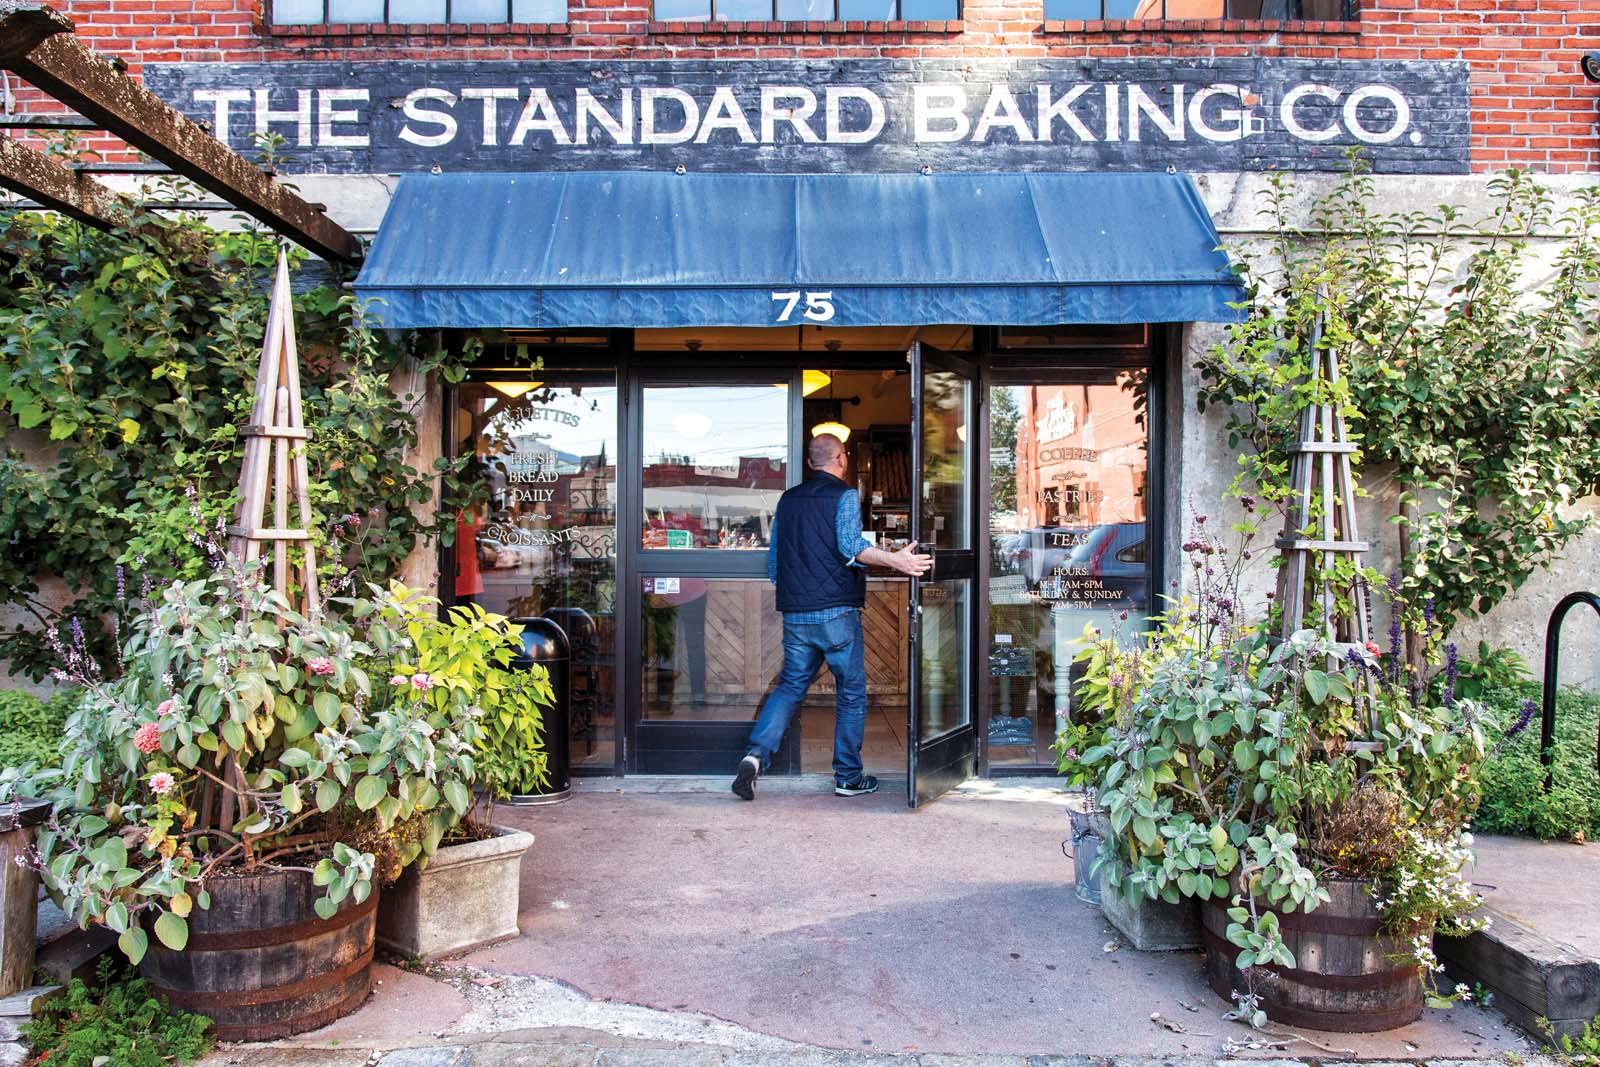 Standard Baking